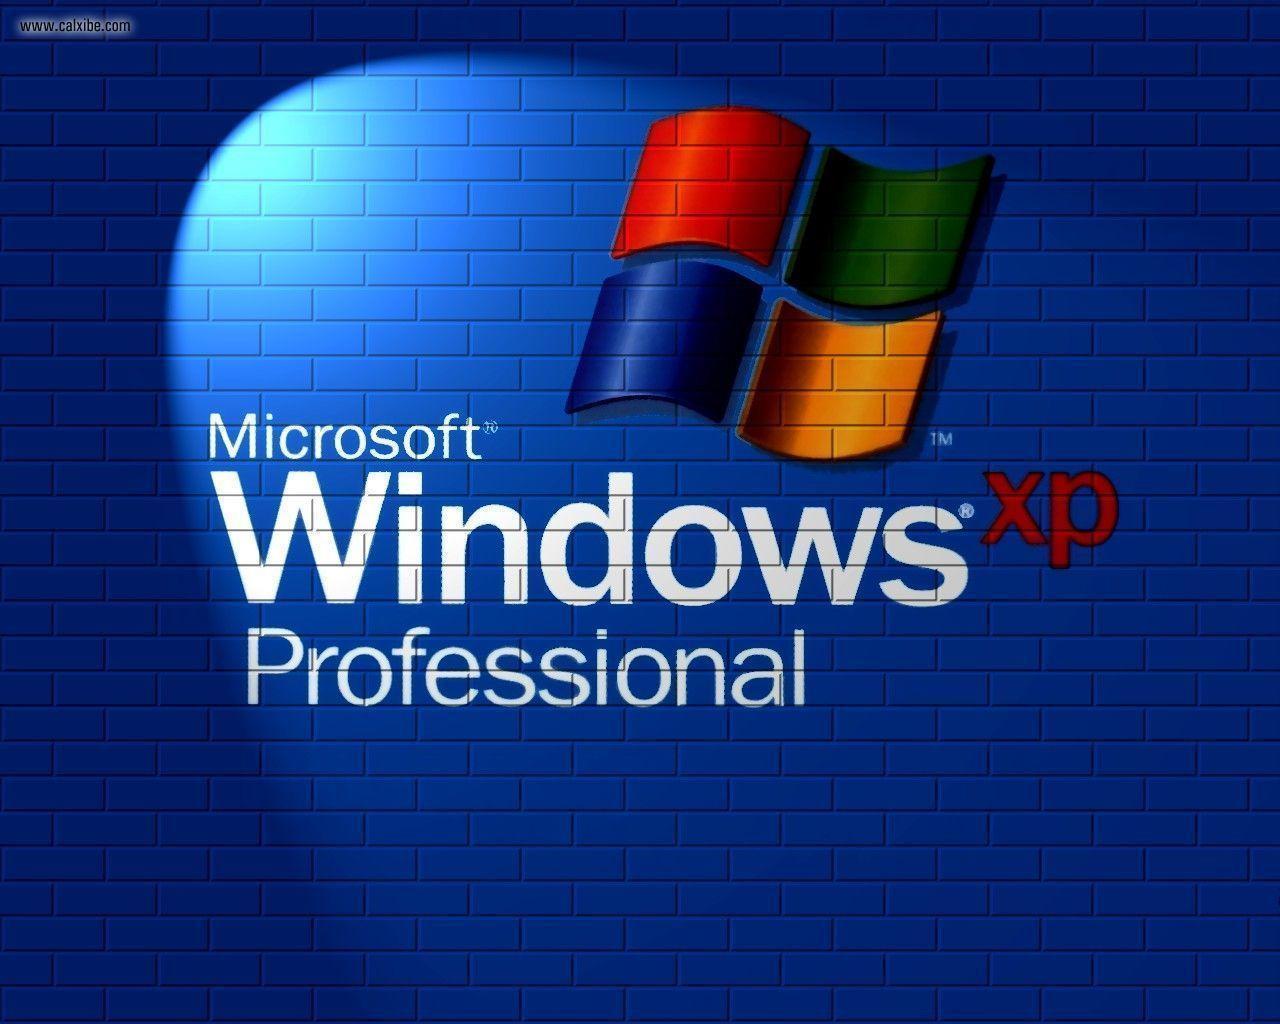 Microsoft windows xp wallpapers wallpaper cave - Car wallpaper for windows xp ...